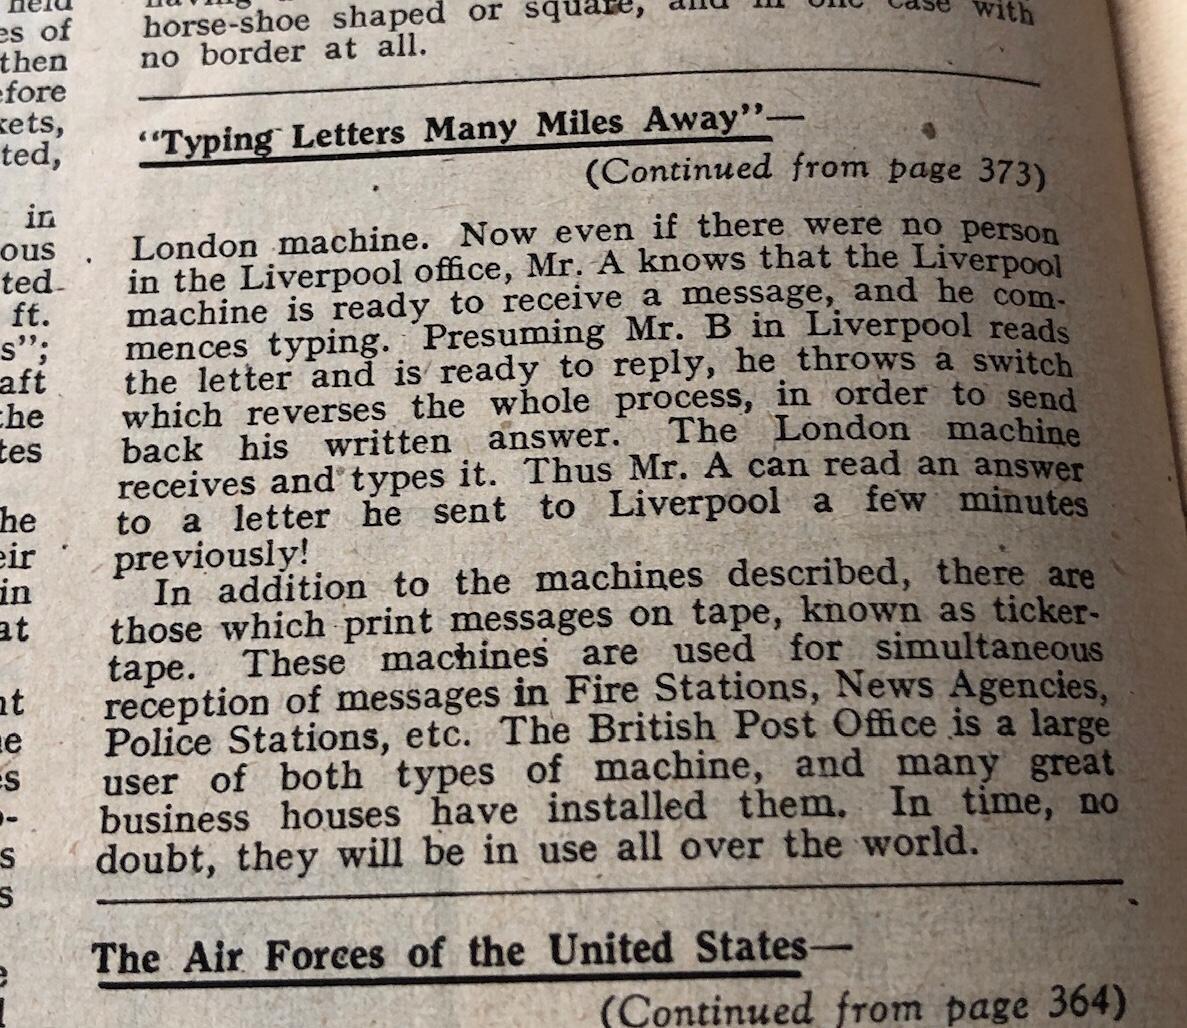 Meccano Magazine, November 1944 - Teleprinter Article